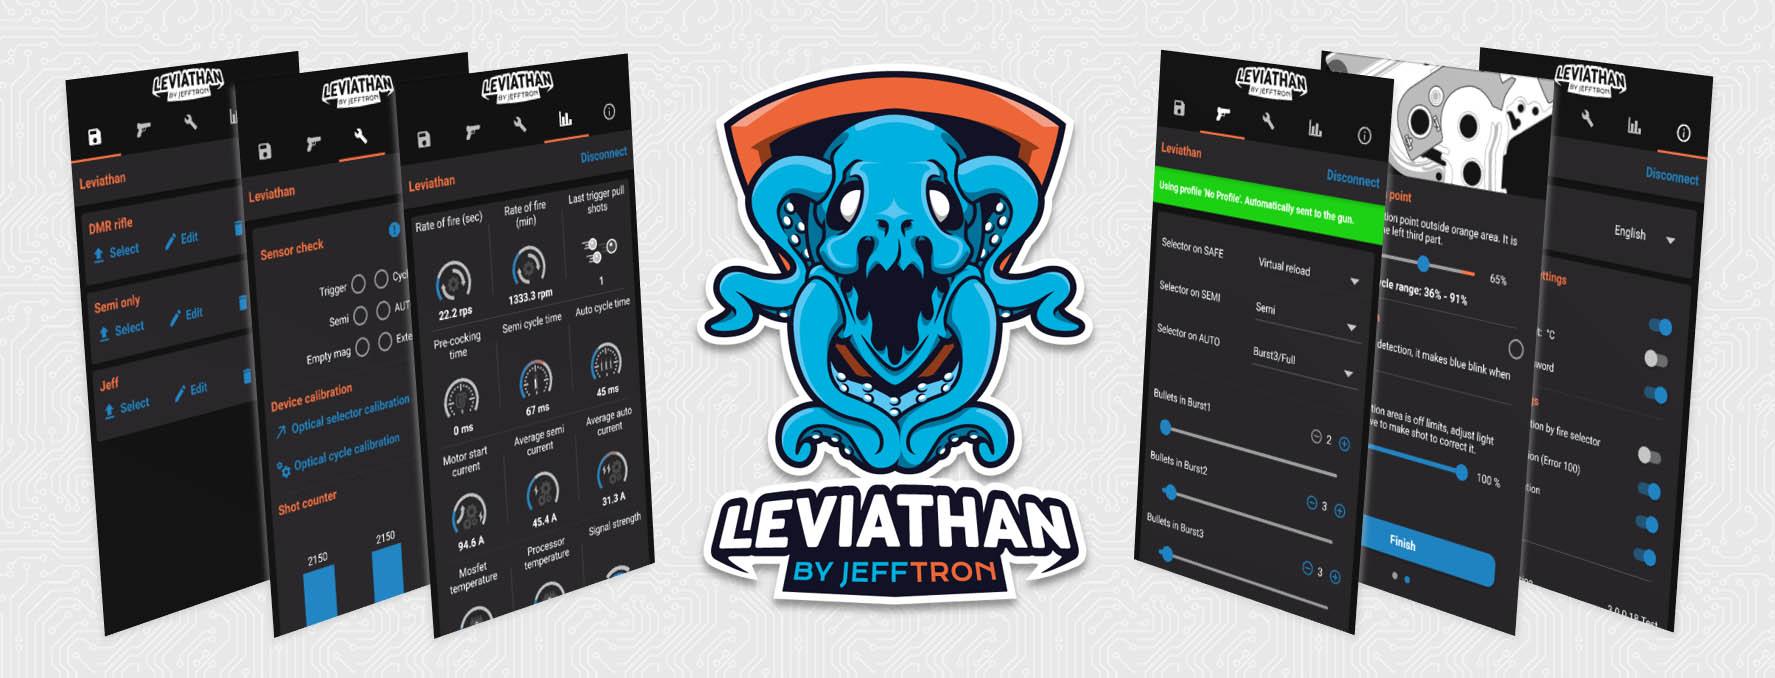 JeffTron Leviathan